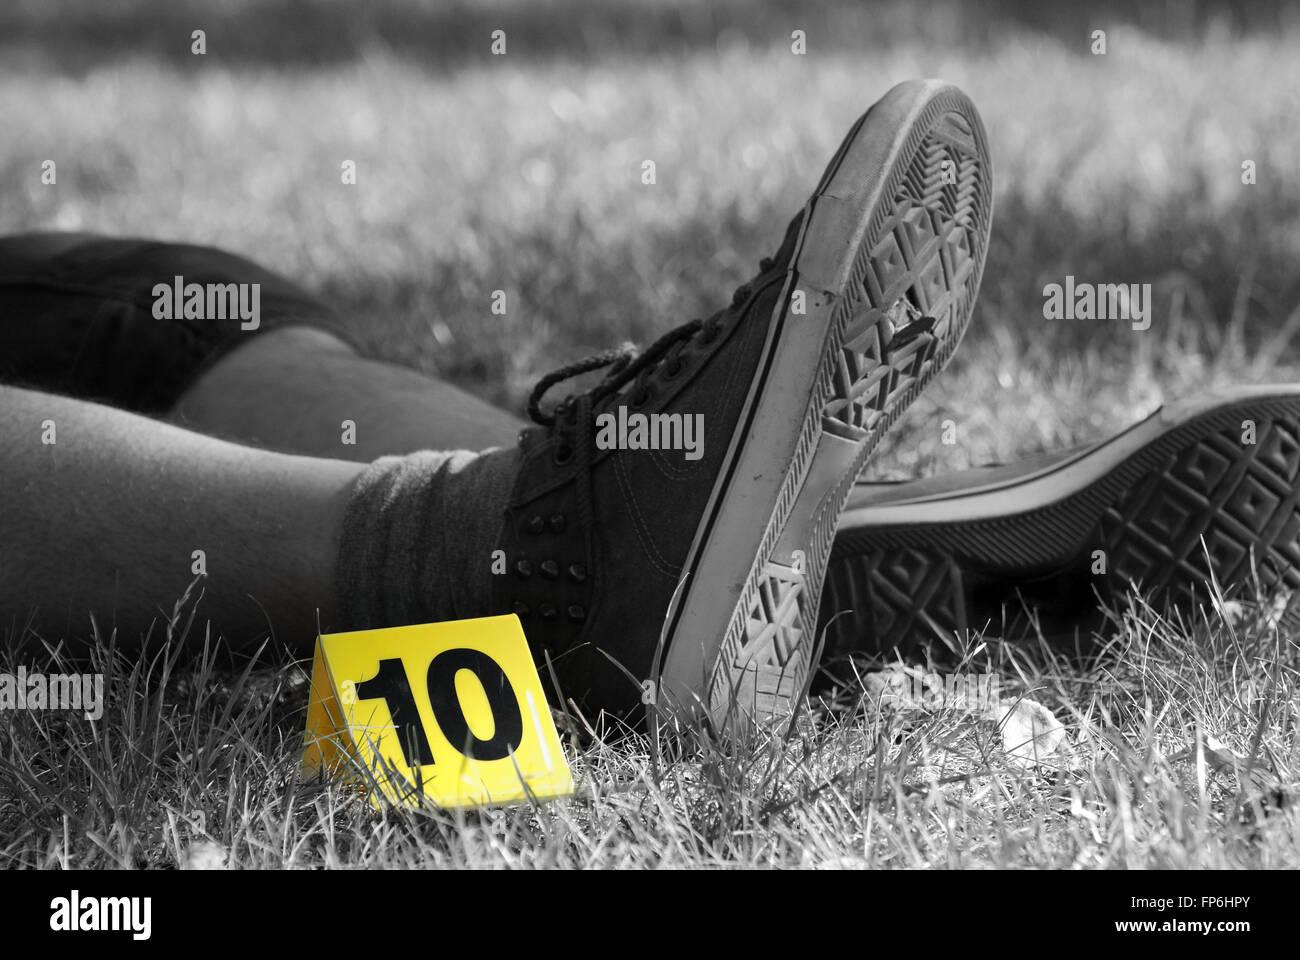 Crime Scene Evidence Markers Near to Legs - Stock Image